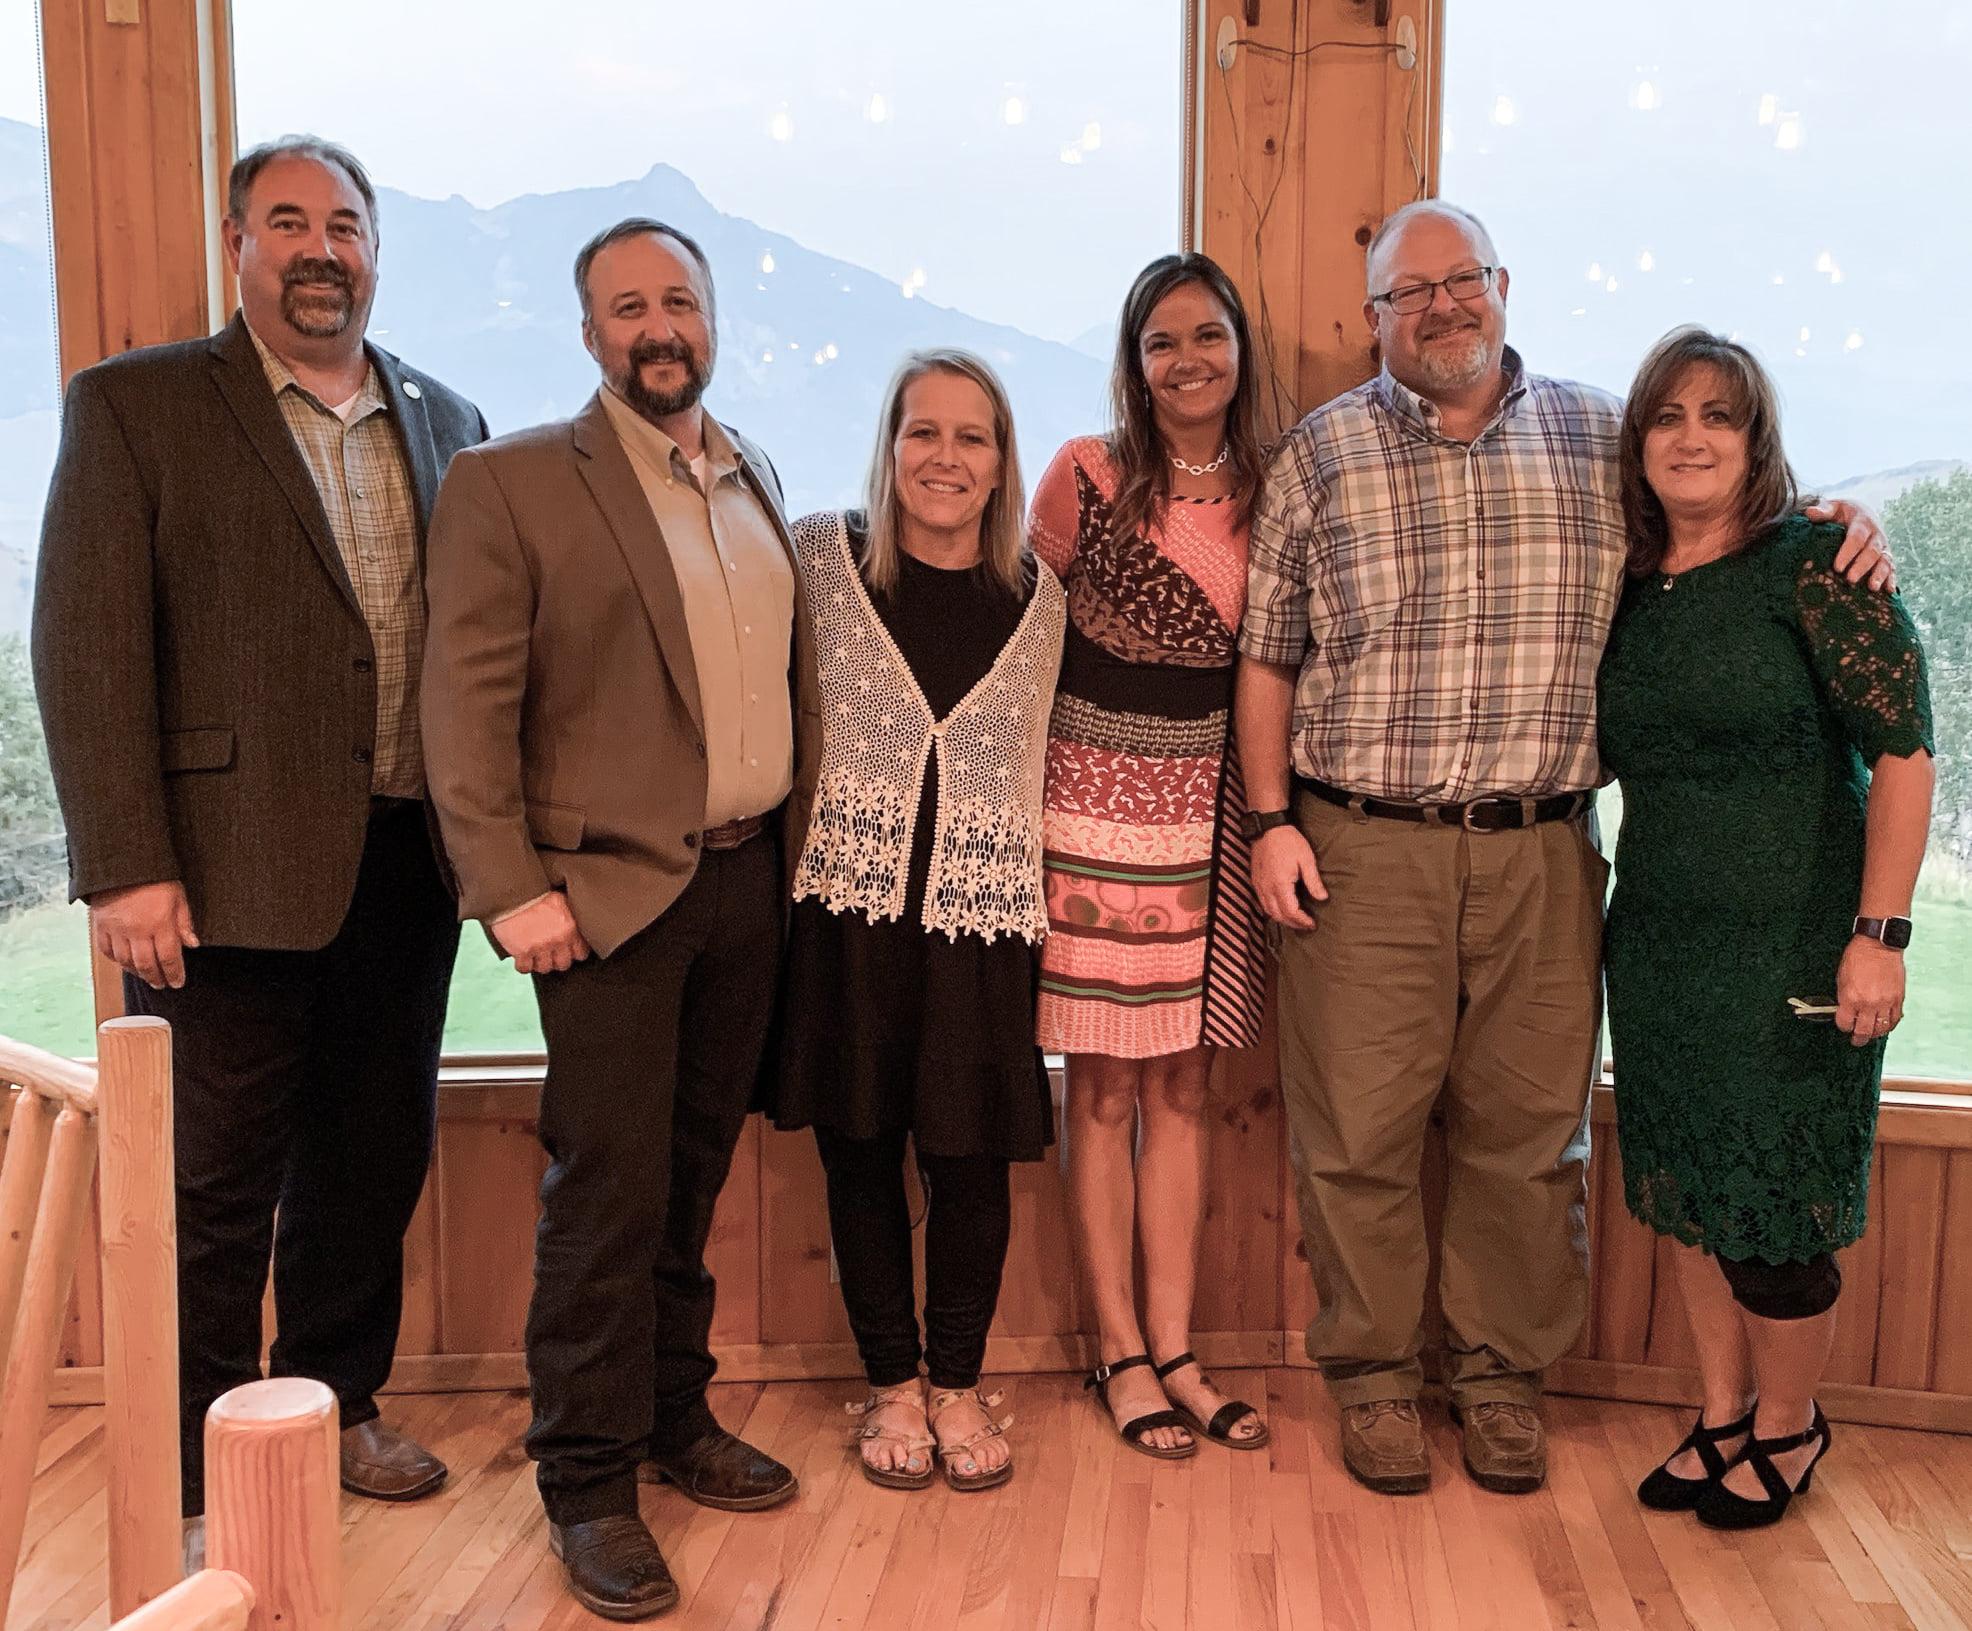 Idaho Association of County Assessors Installs New Leadership for 2021-2022